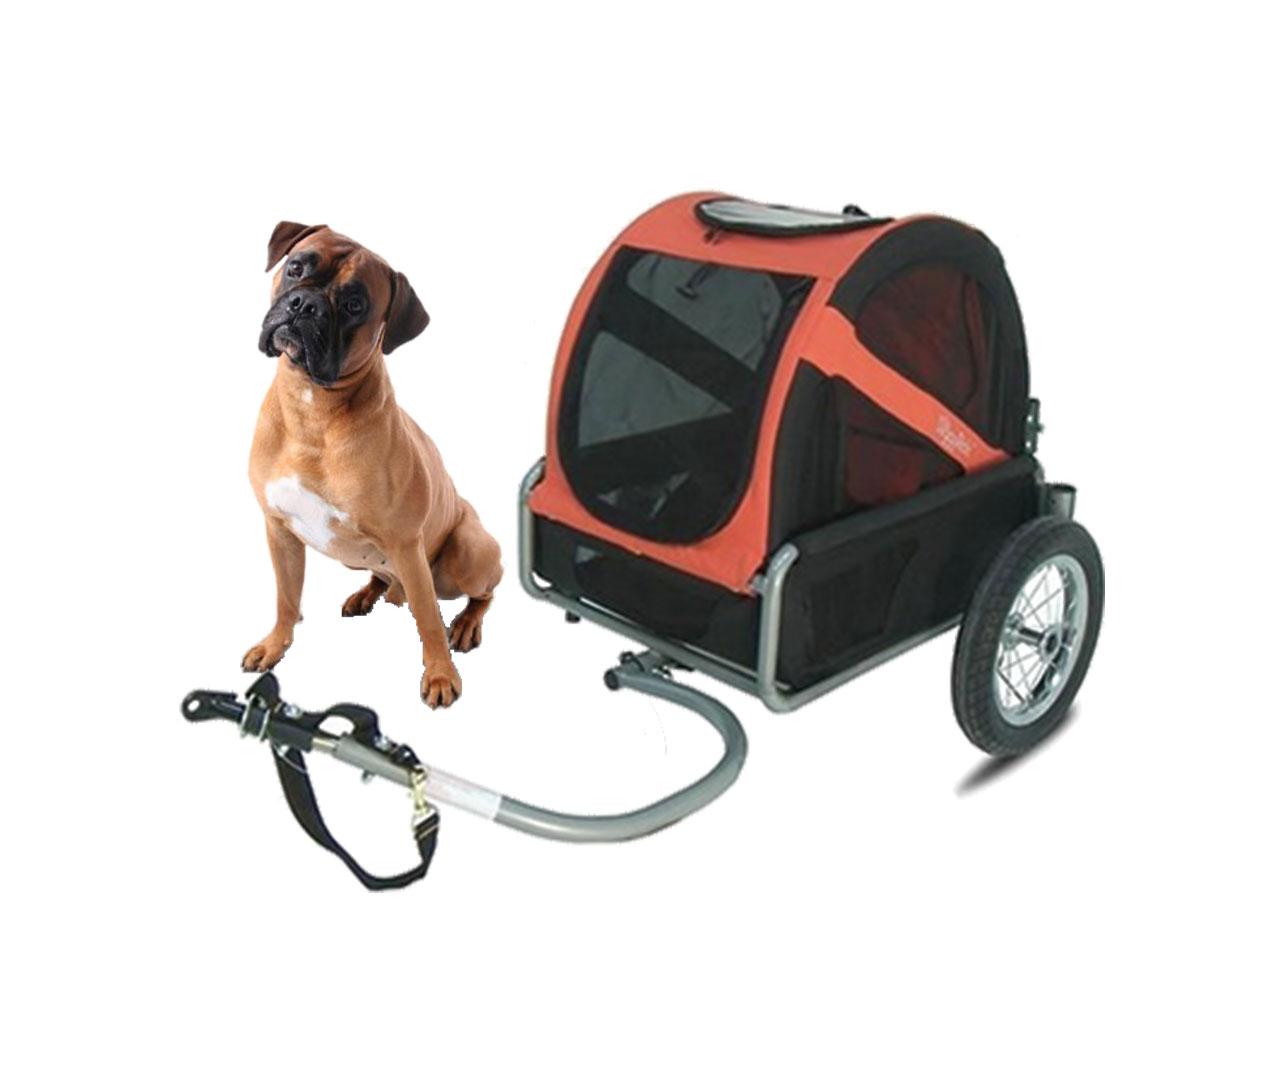 remorque-velo-pour-chiens-doggyride-mini-trailer_VELOS17-LOISIRS ile d'oleron